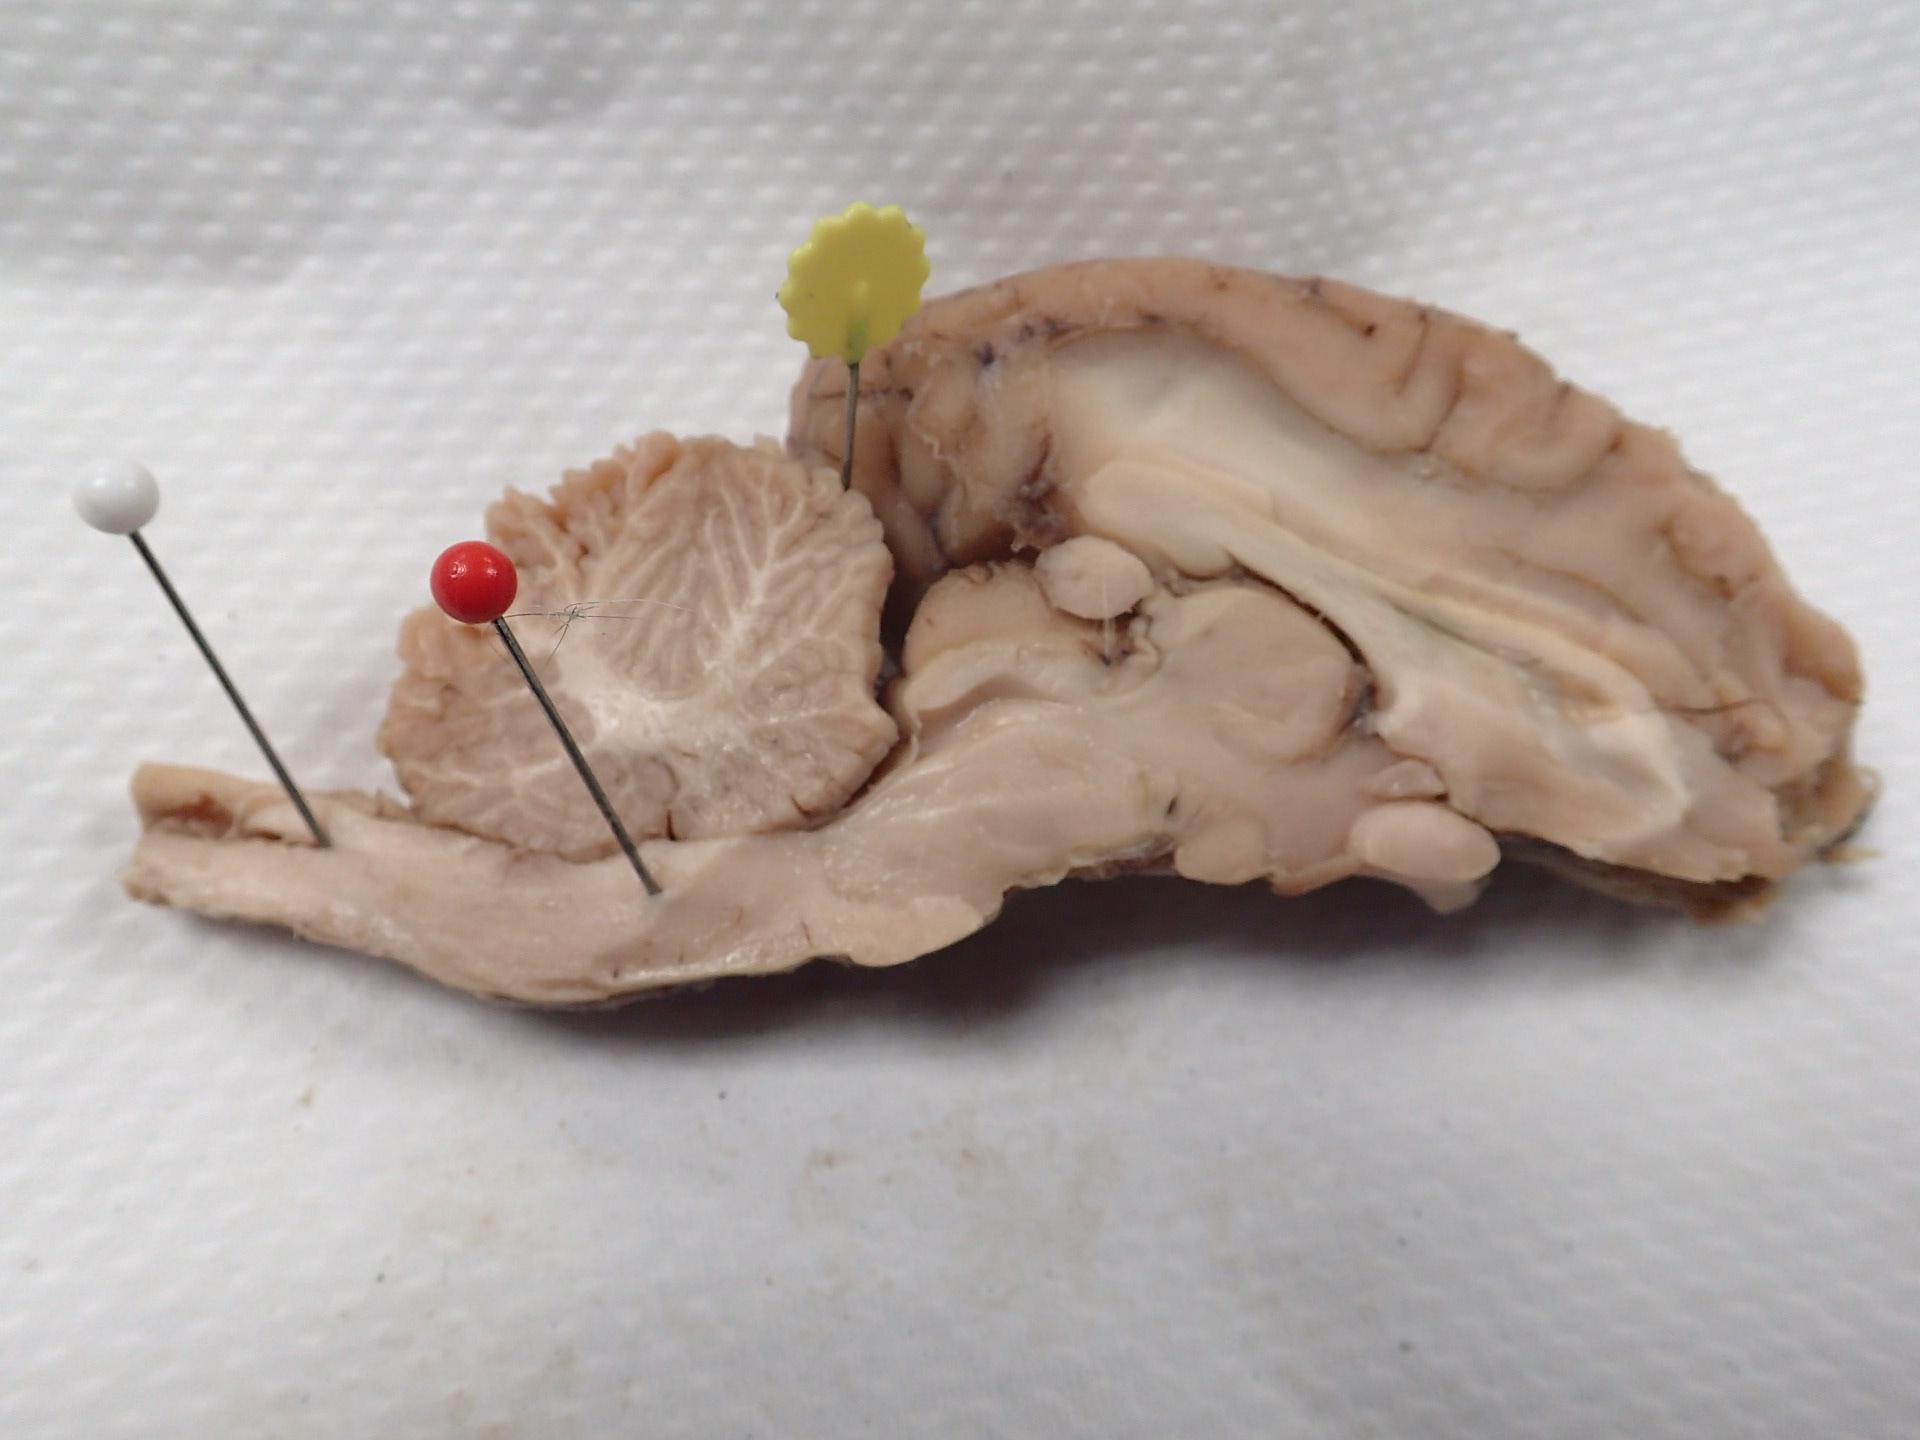 Sheep Brain Dissection | Anatomy Corner